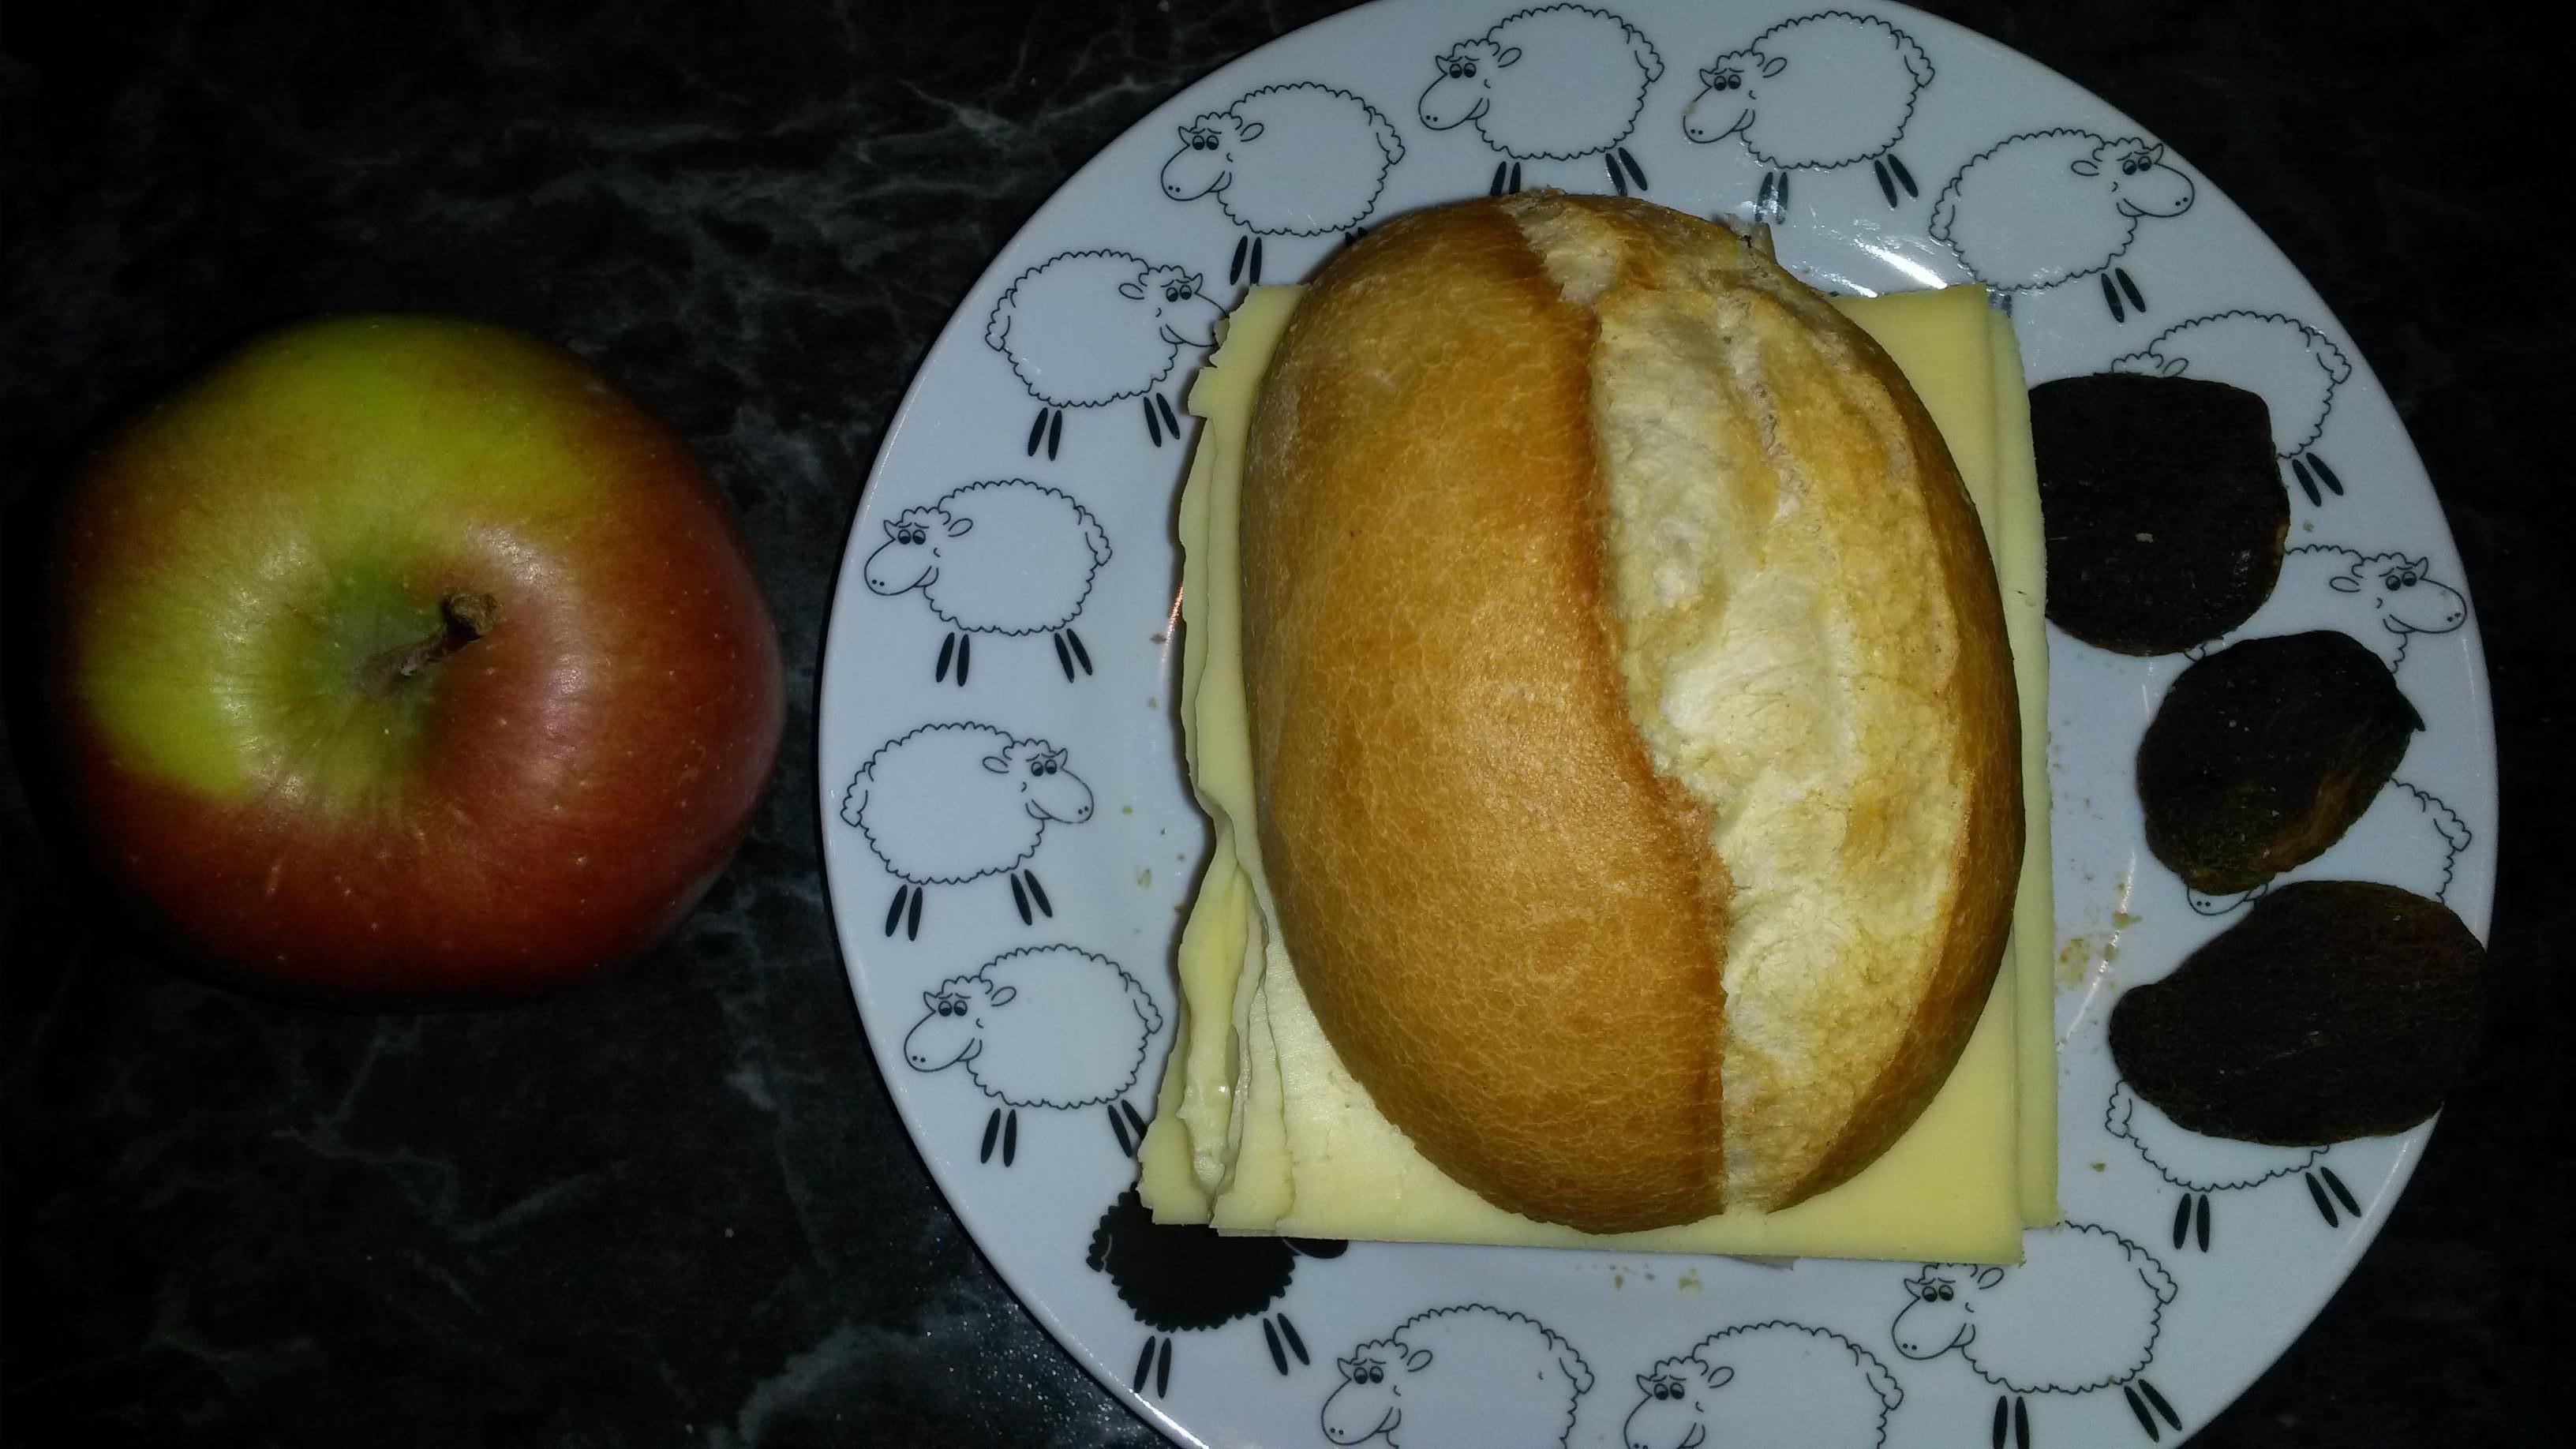 http://foodloader.net/sk0r_2014-02-21_Kaesebroetchen_und_Obst.jpg